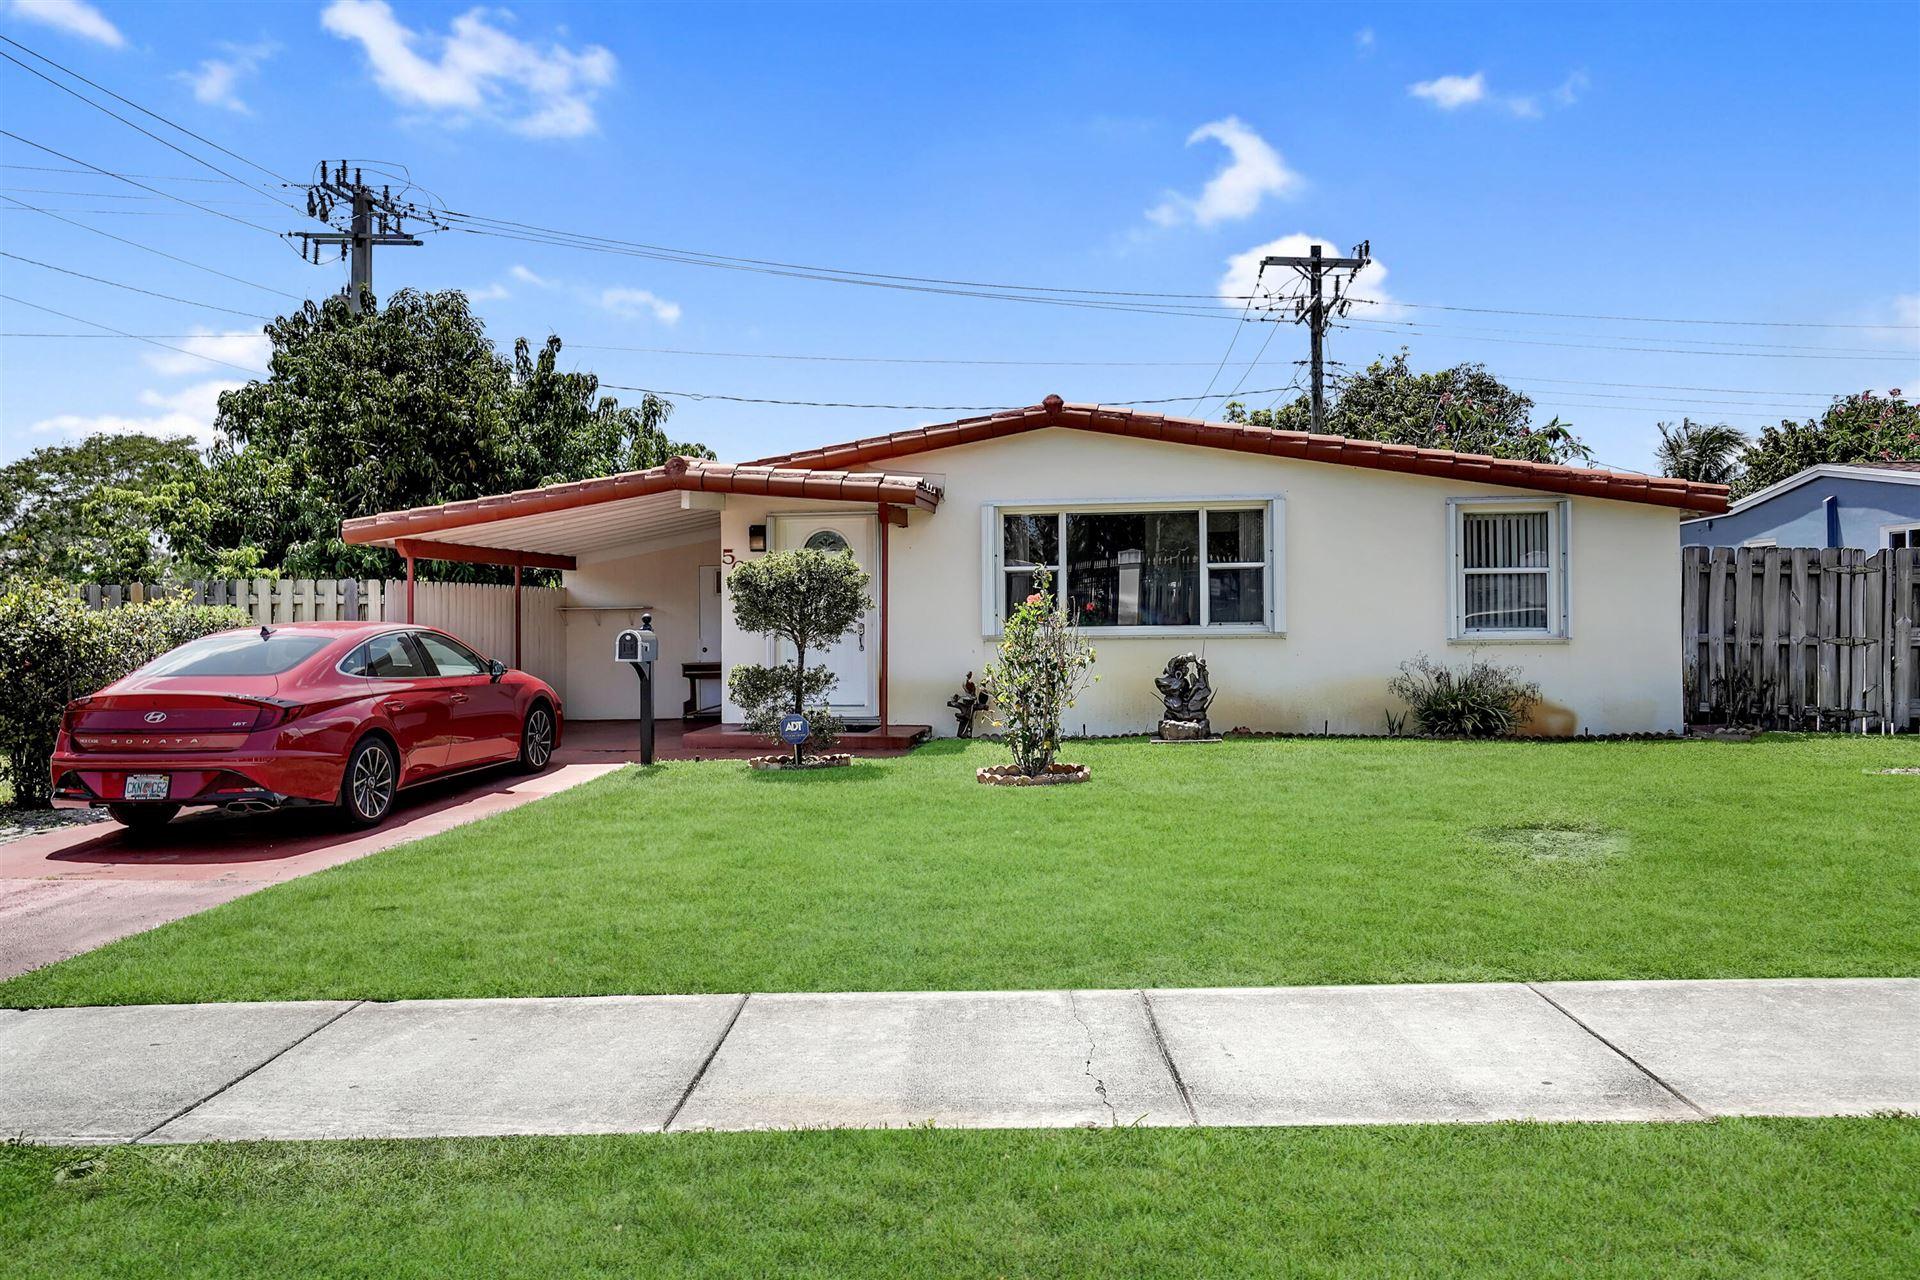 5601 NE 9 Avenue, Oakland Park, FL 33334 - MLS#: RX-10714225